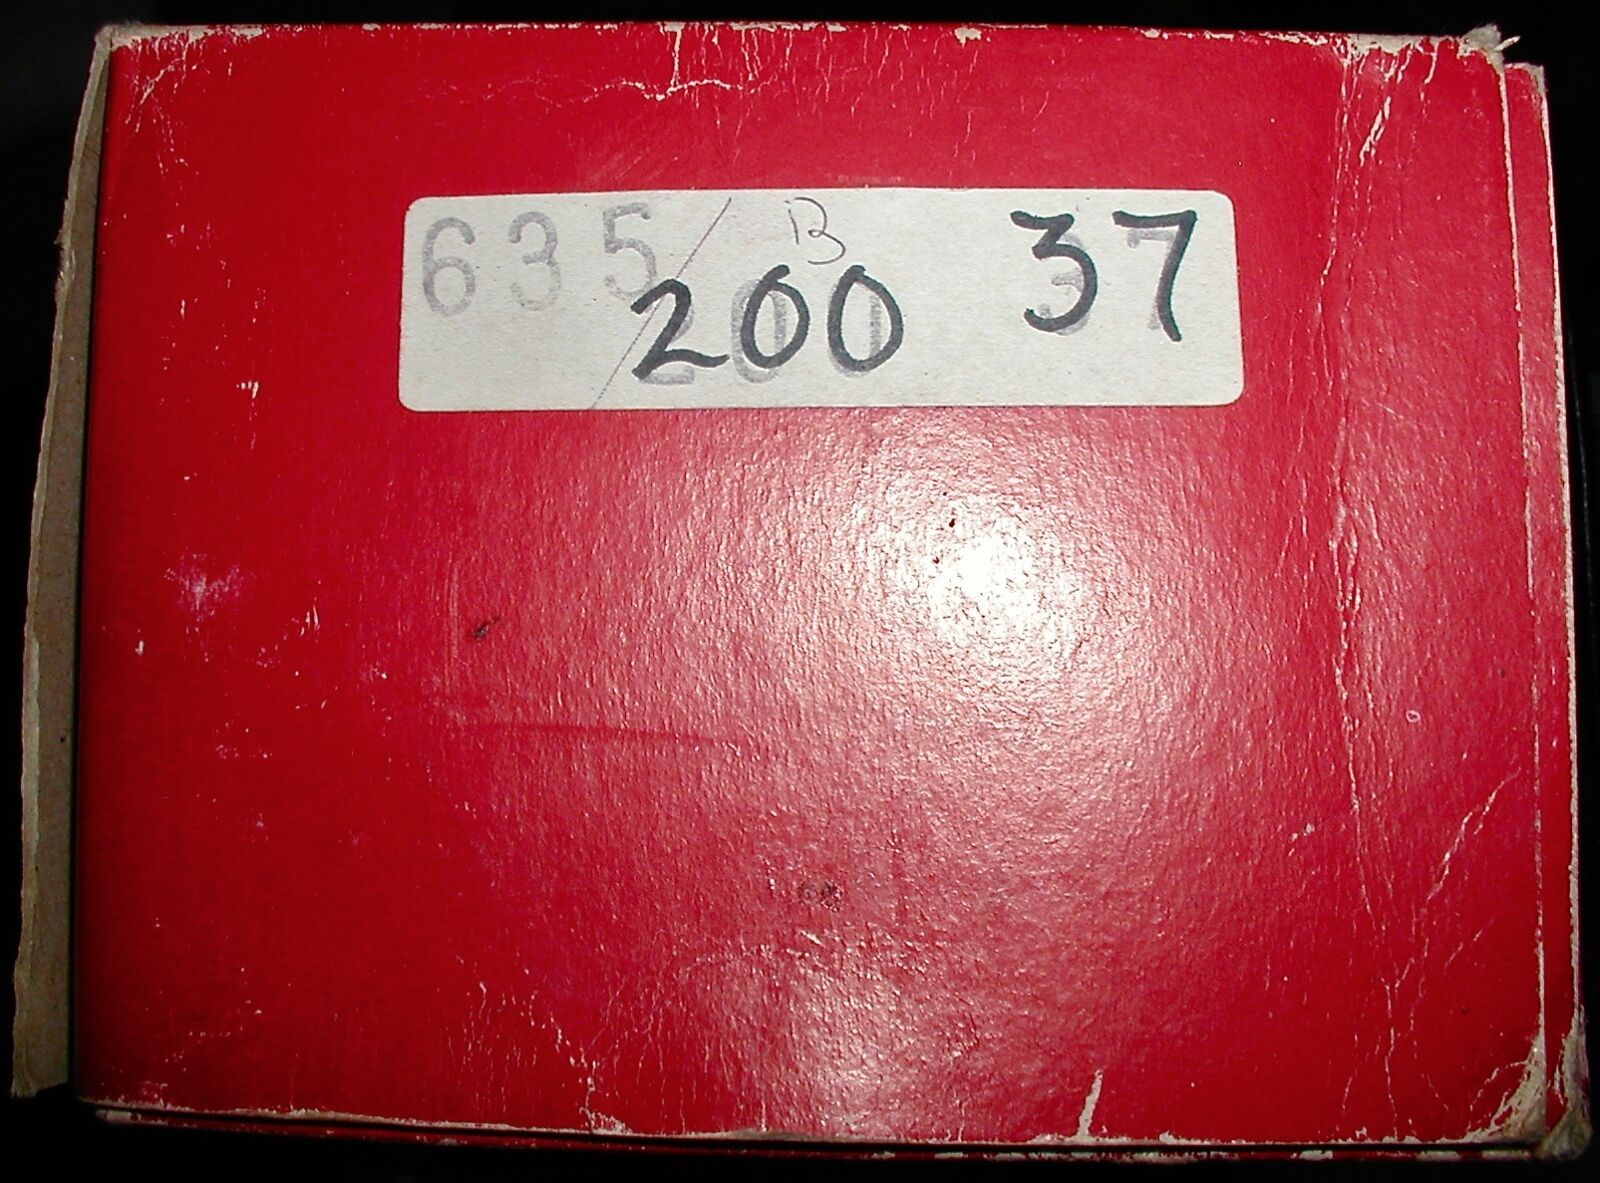 1960's Pelle (4.5), Bicycle scarpe, NOS, Italy, 37 (4.5), Pelle Cortina 200, FREE Ship USA 7fd854